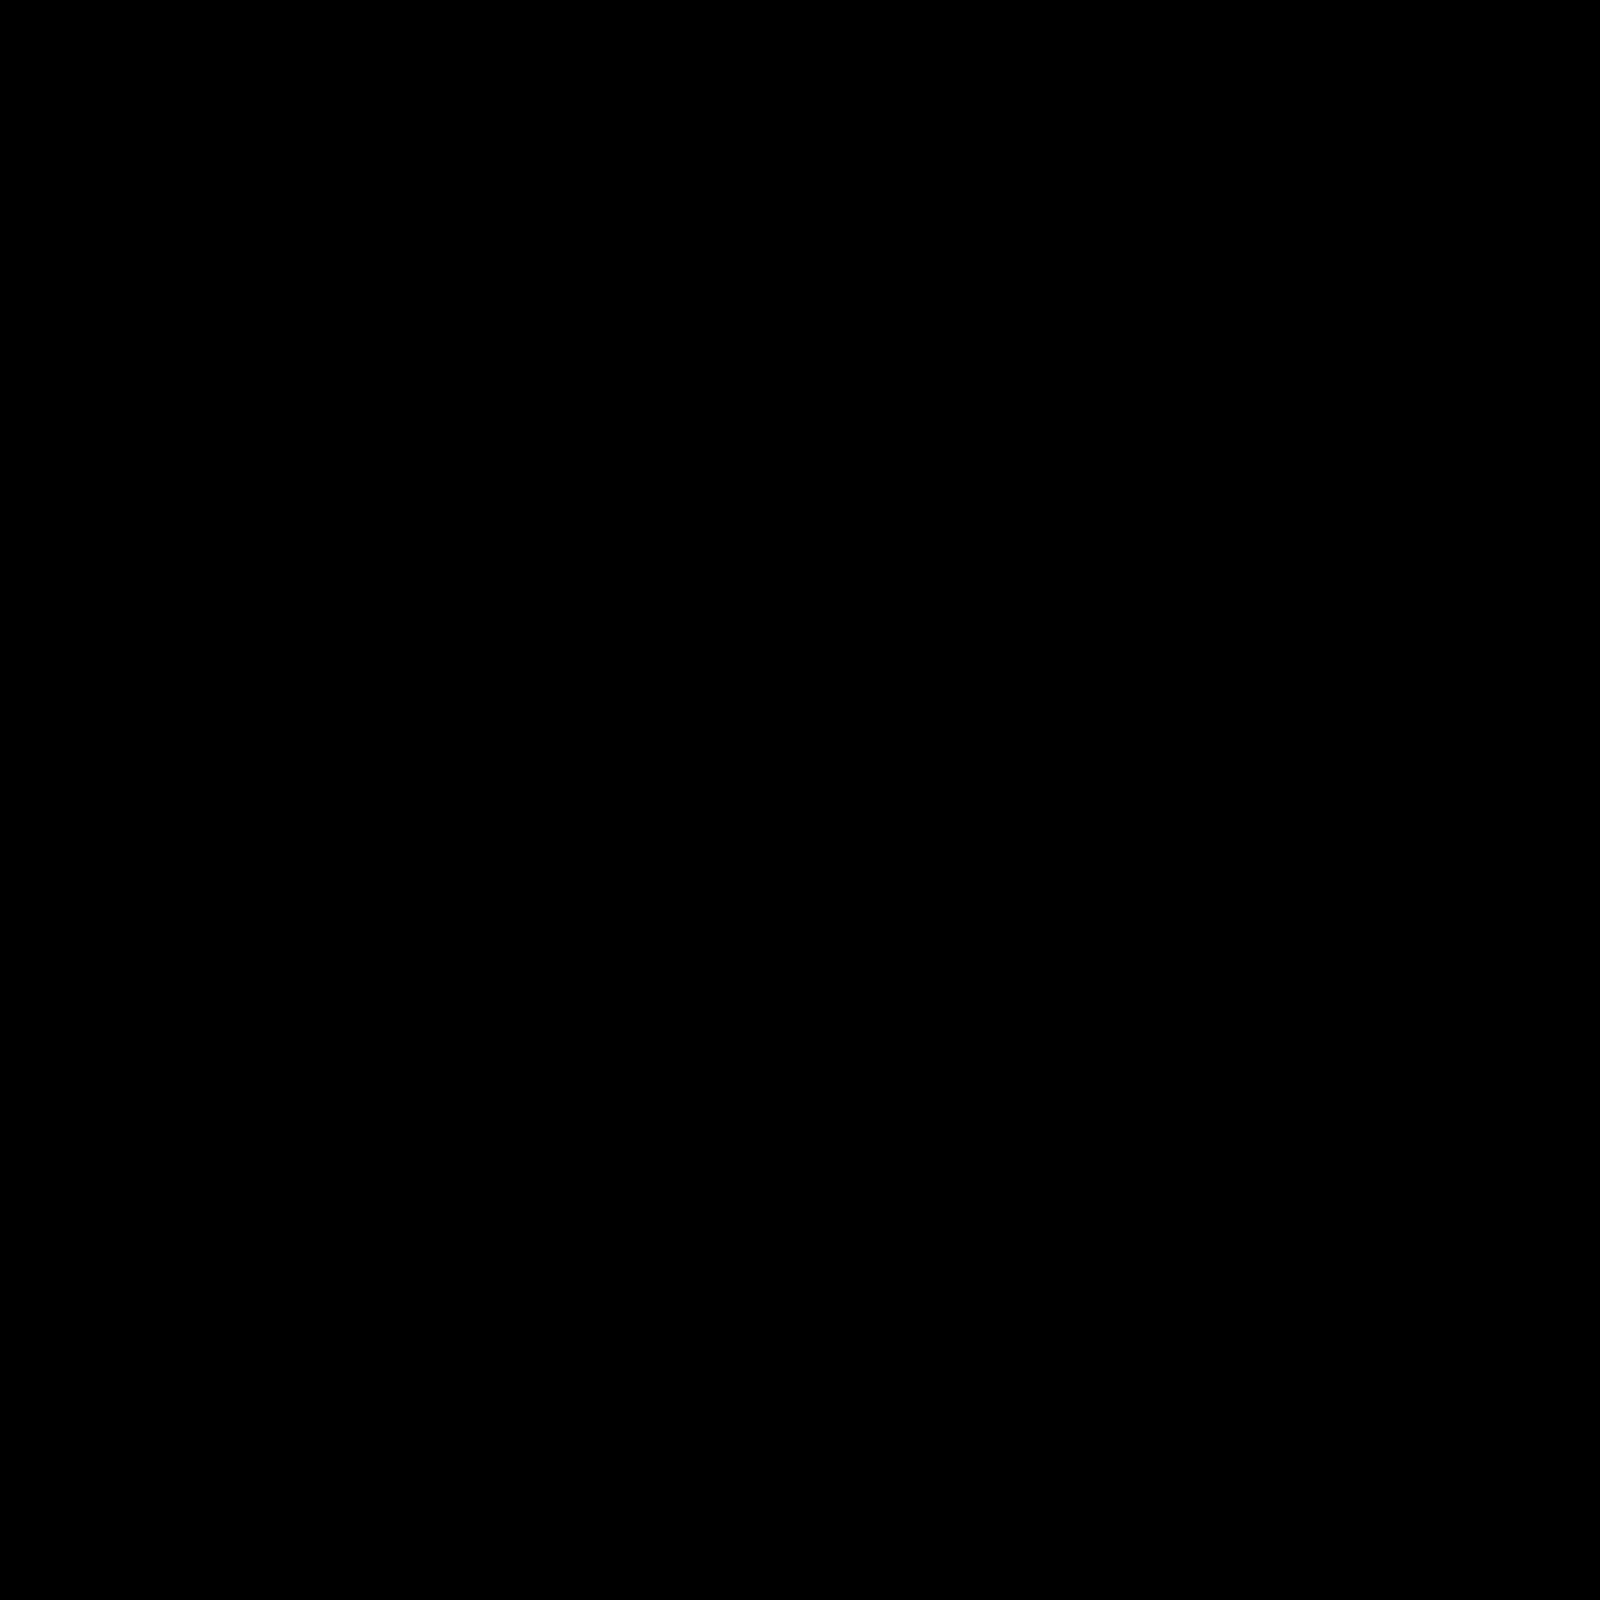 Strategie-Brett icon